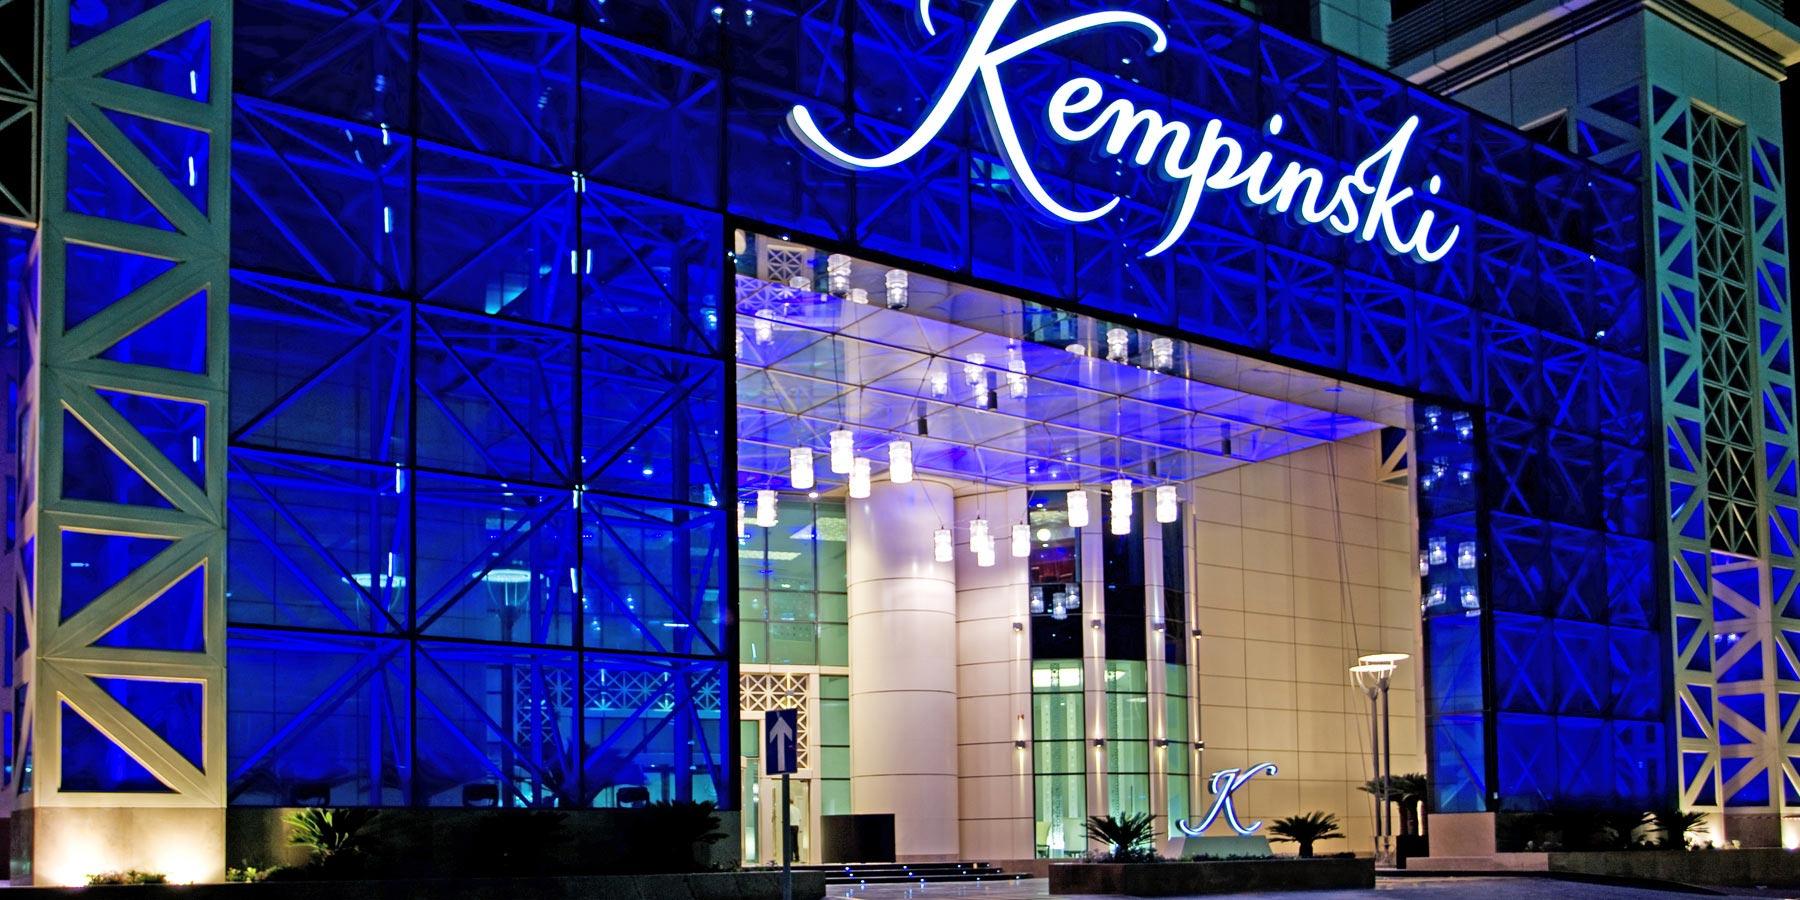 Kempinski-Res-02a